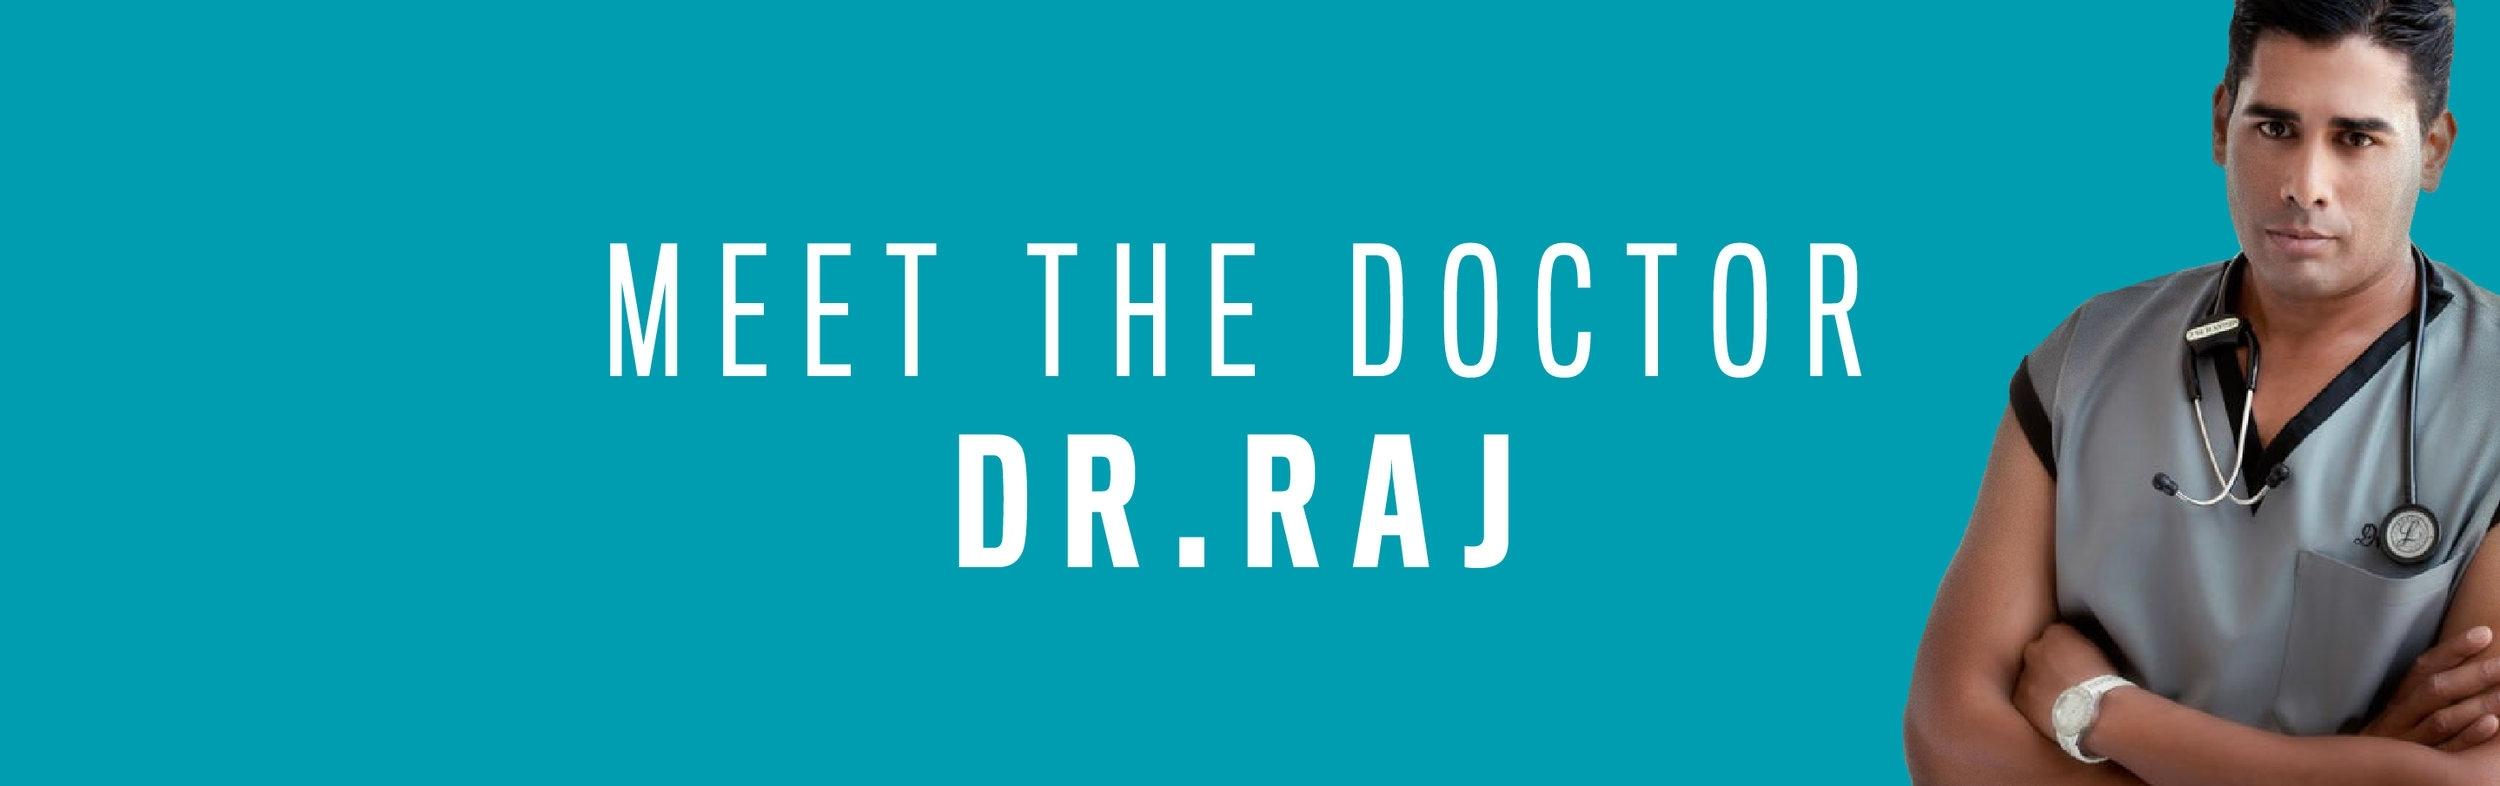 meet the doctor Drraj-01-04.jpg